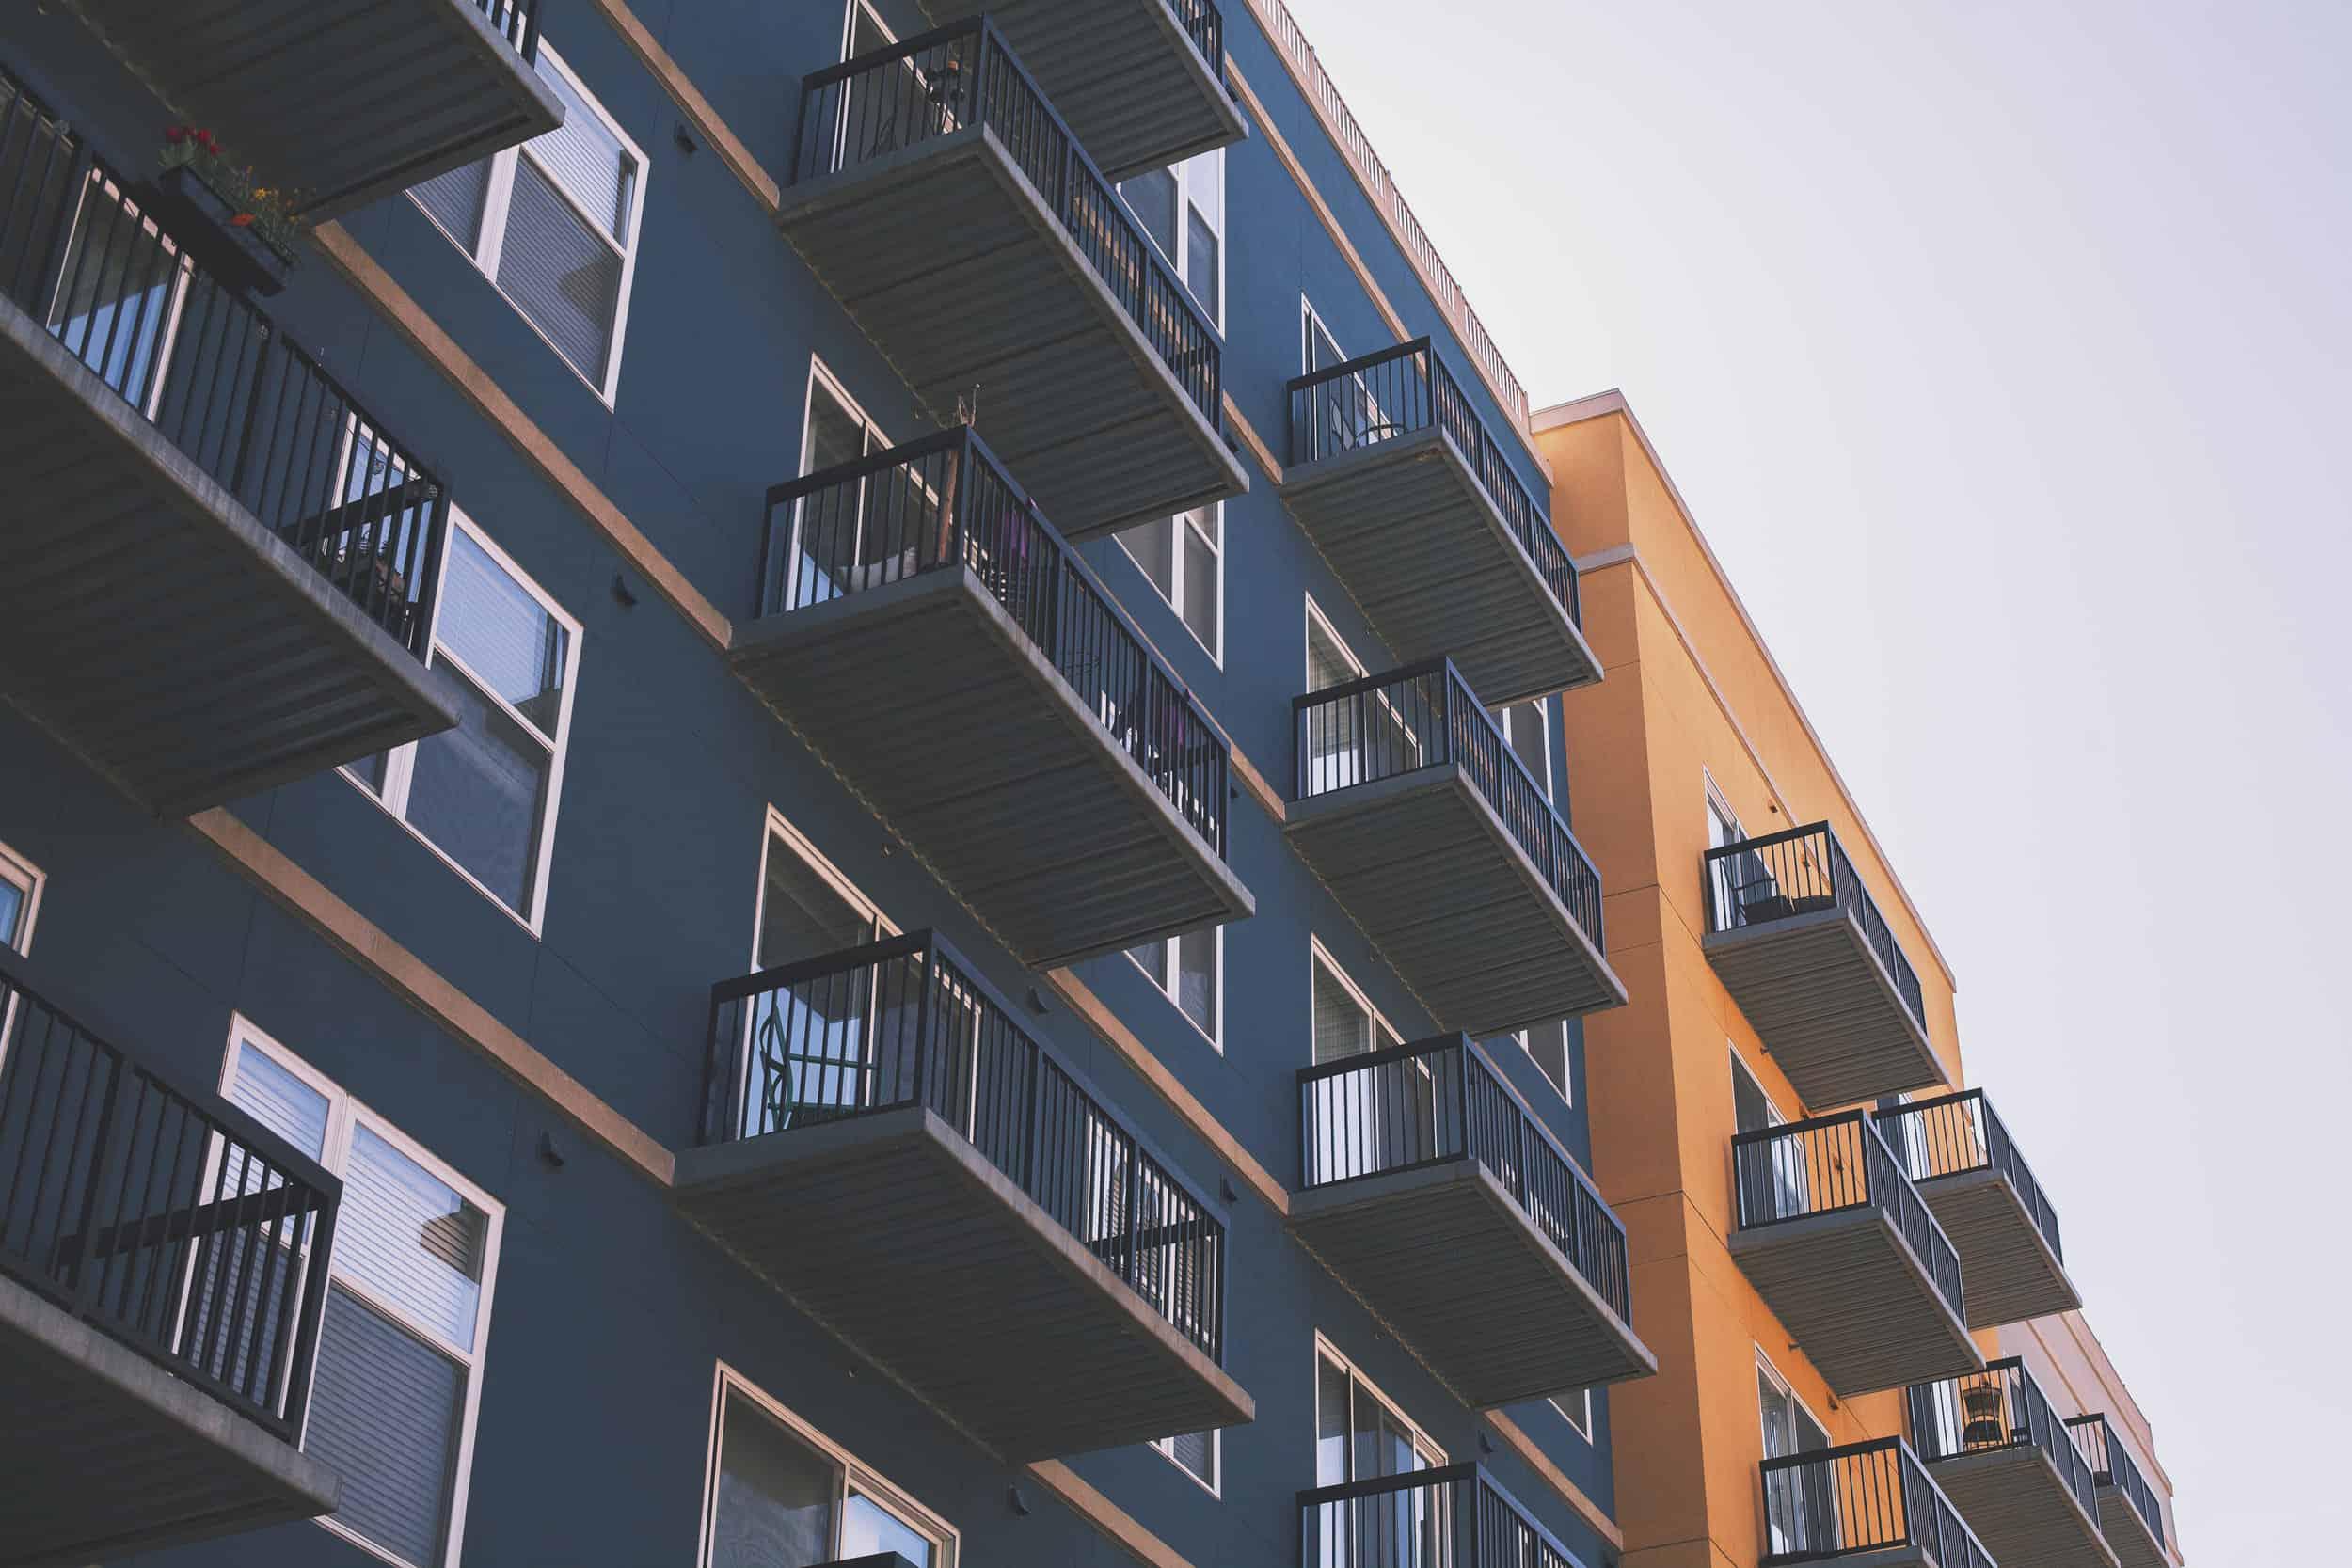 COVID-19 Exacerbates the Existing Housing Crisis